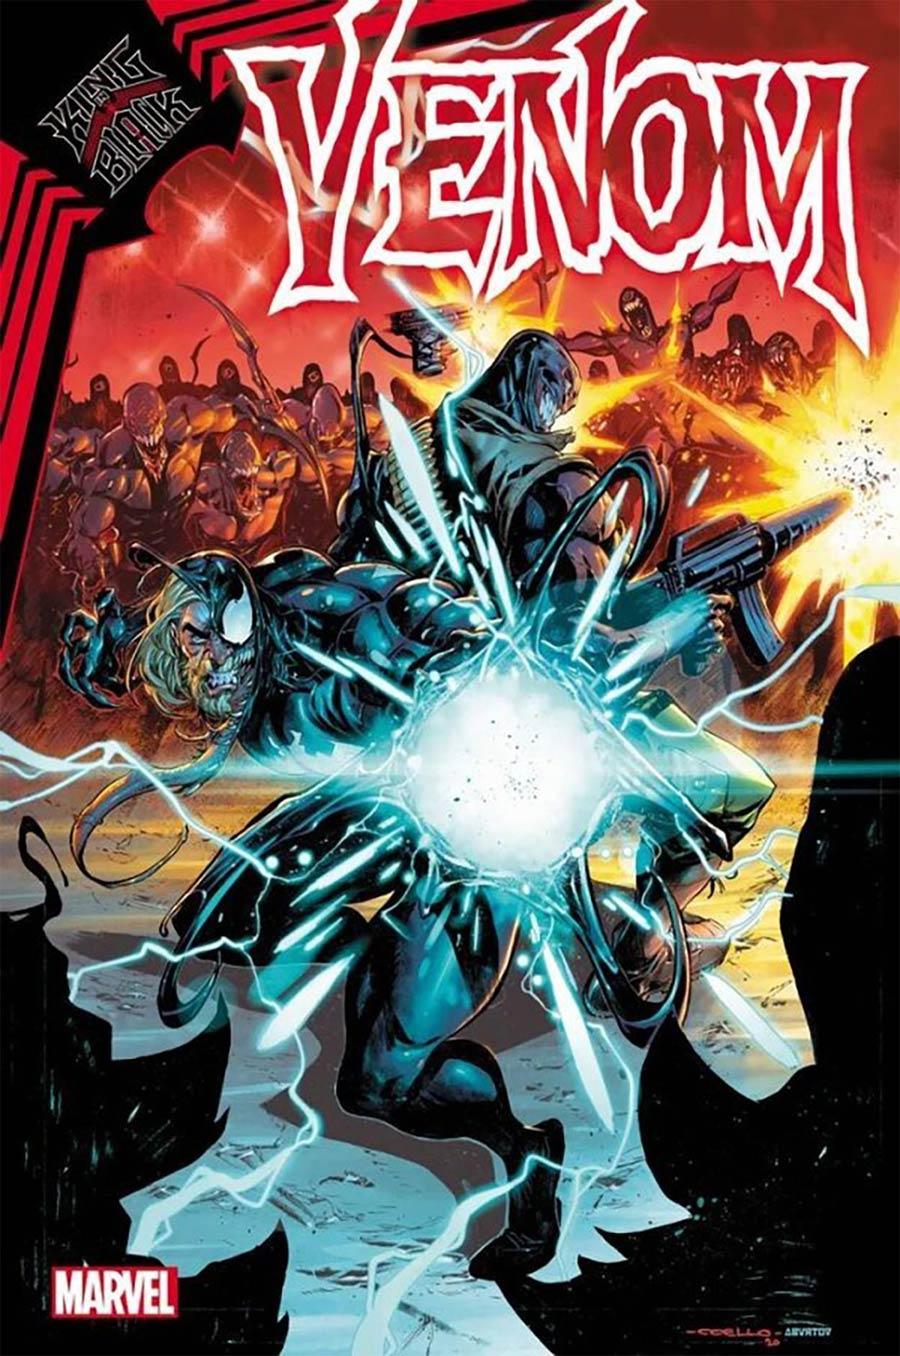 Venom Vol 4 #32 Cover E DF Signed By Donny Cates (King In Black Tie-In)